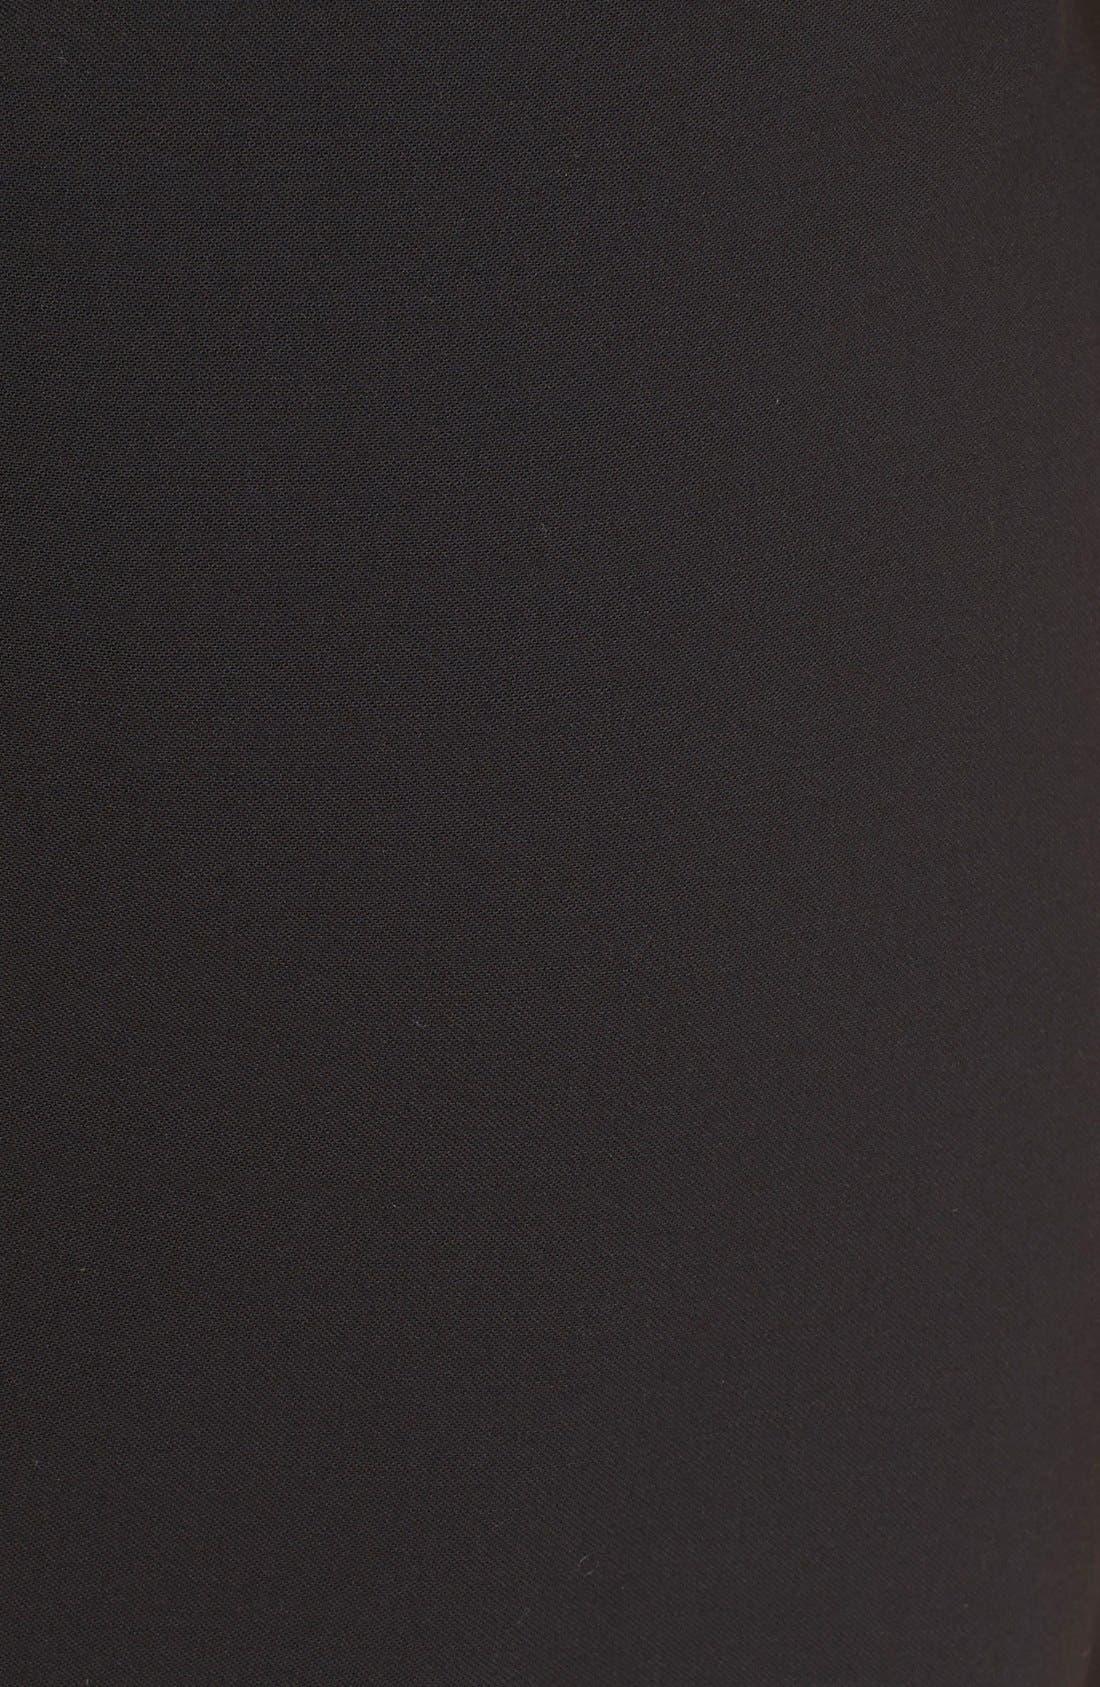 Alternate Image 3  - Michael Kors Belted Wool Wrap Skirt